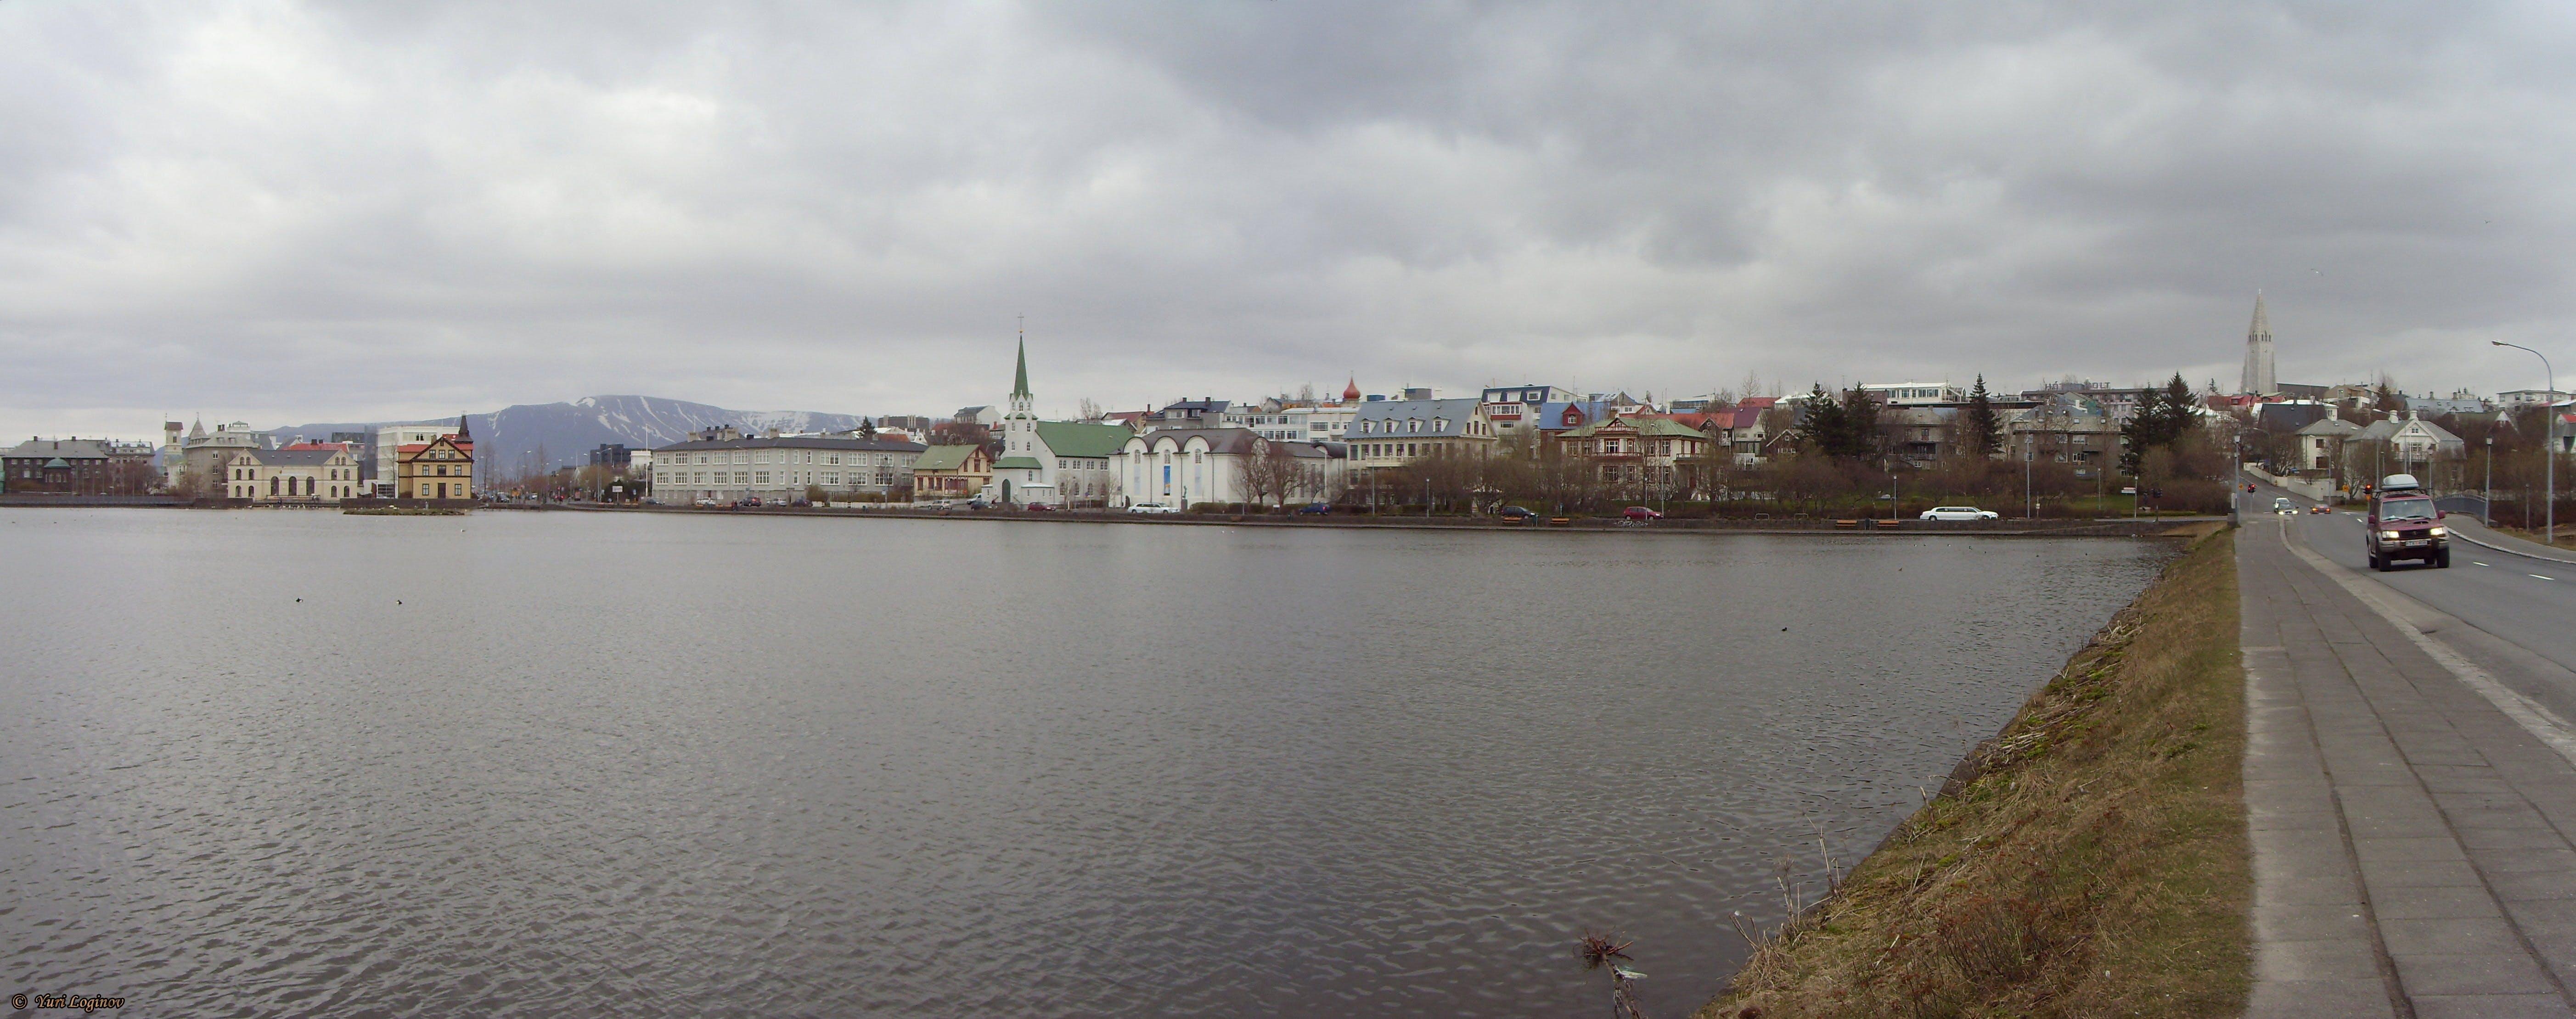 Free stock photo of iceland, island, reykjavik, Tjörnin